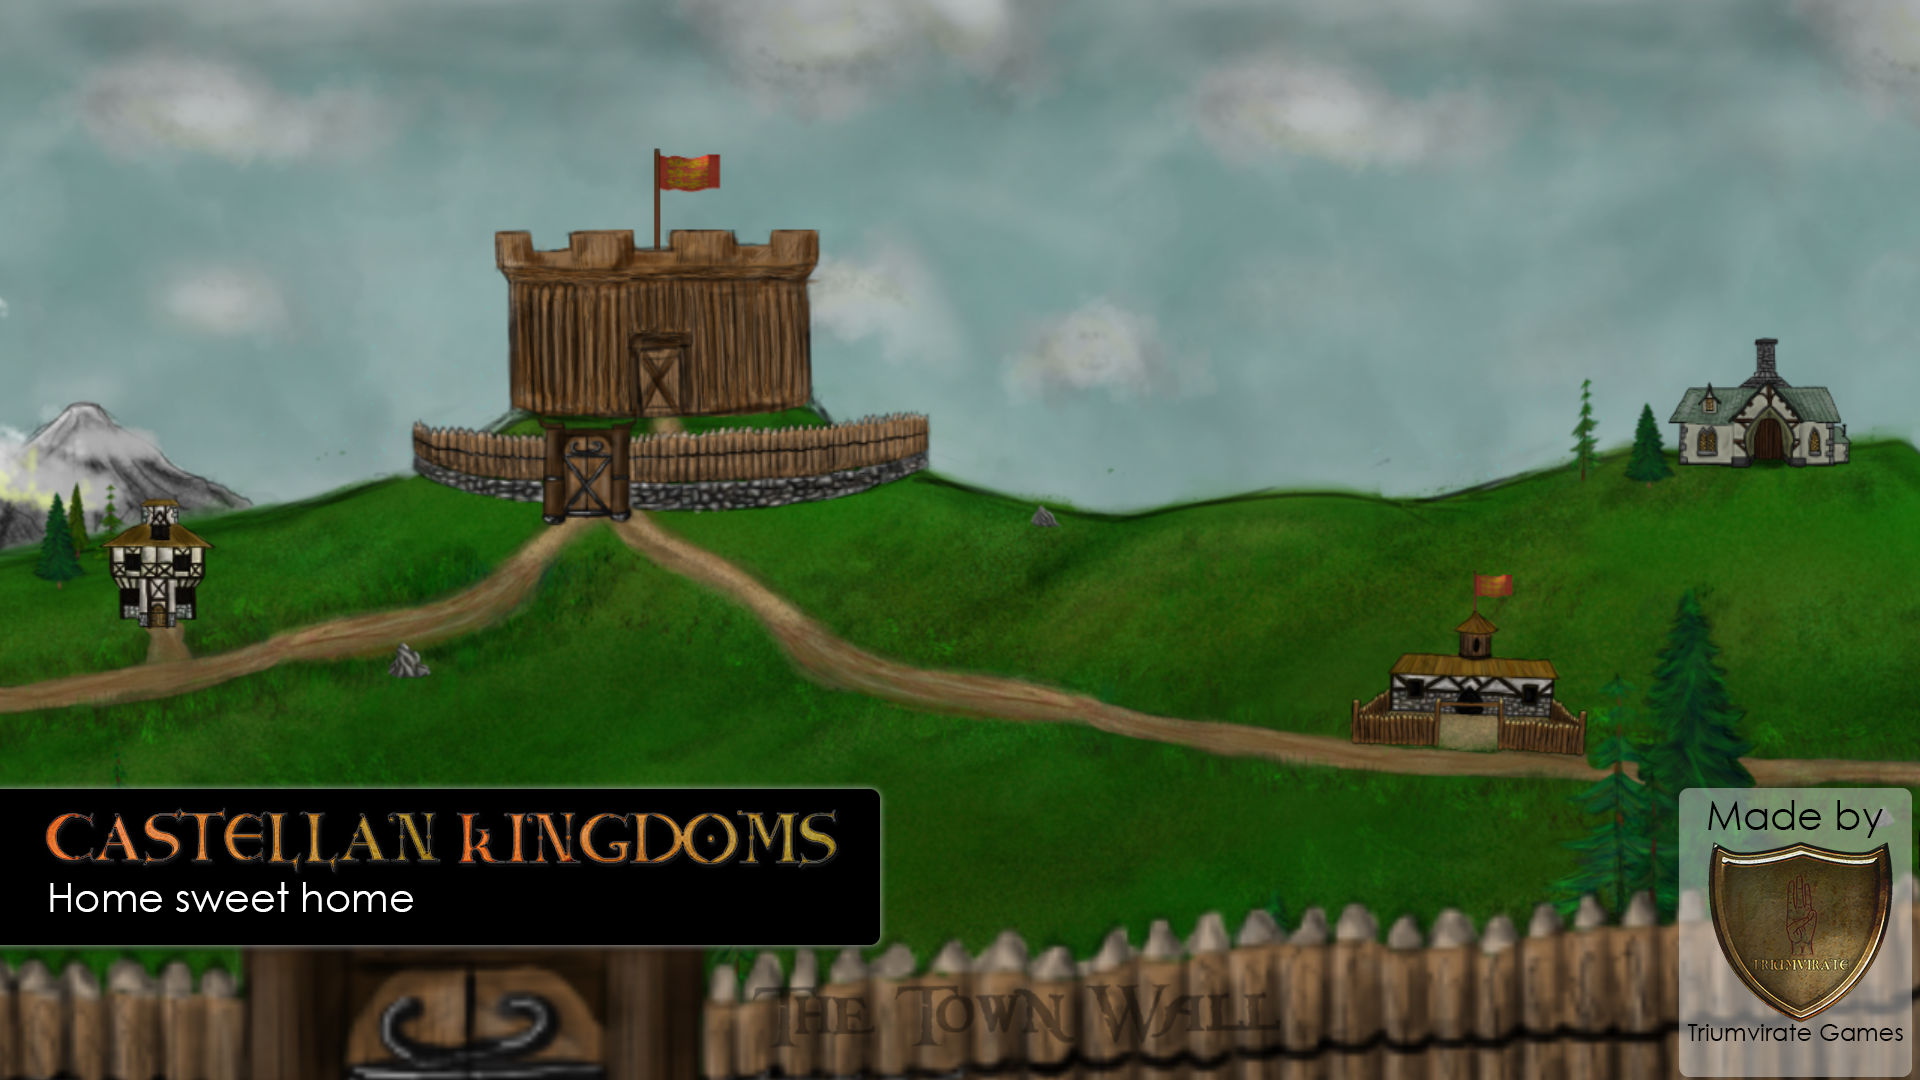 Castellan Kingdoms home sweet home